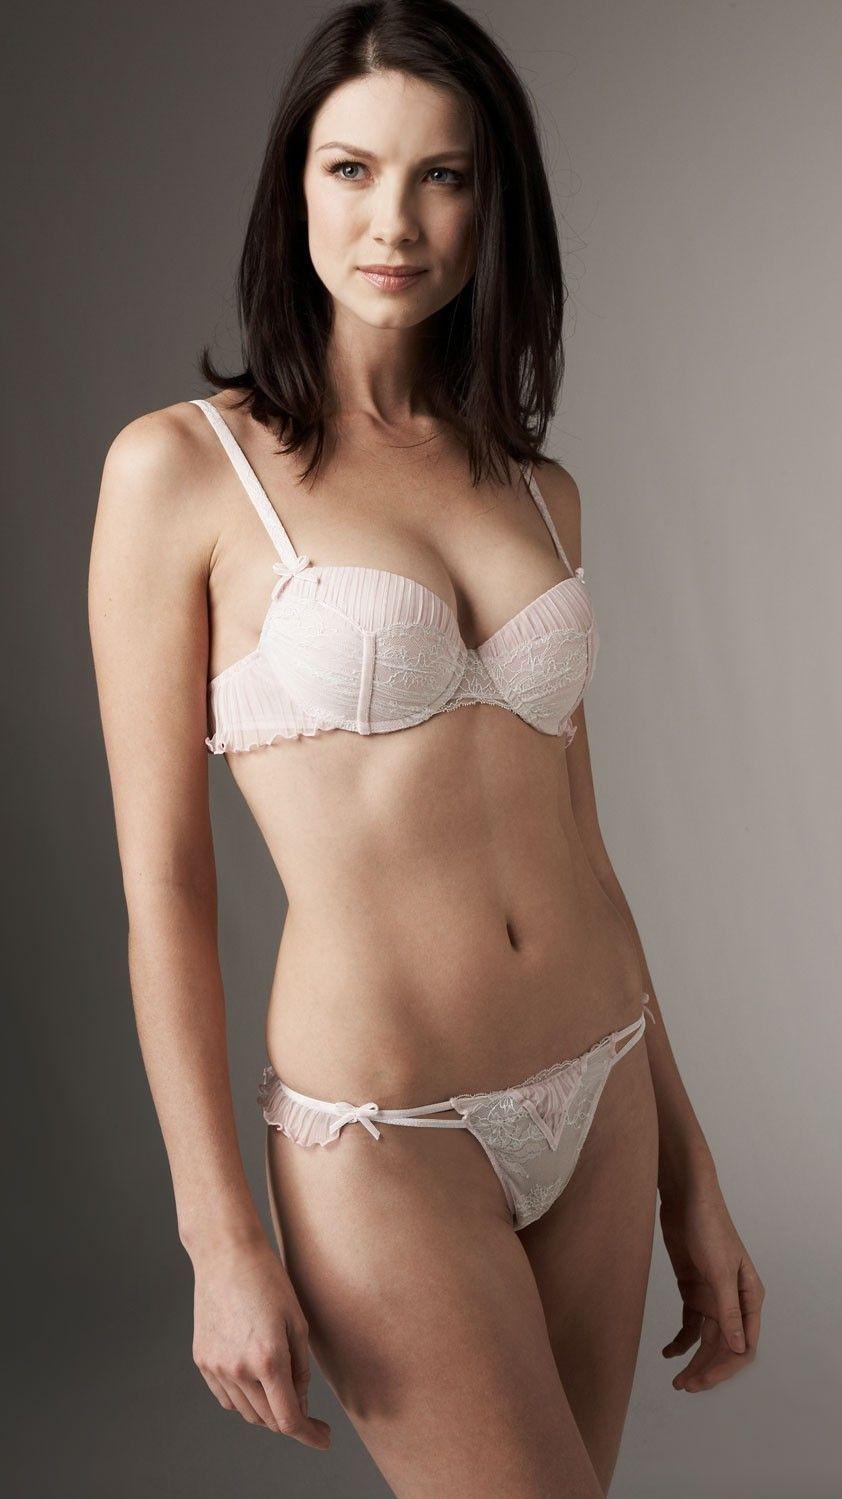 Erotica Caitriona Balfe nude (37 photos), Topless, Cleavage, Selfie, butt 2015